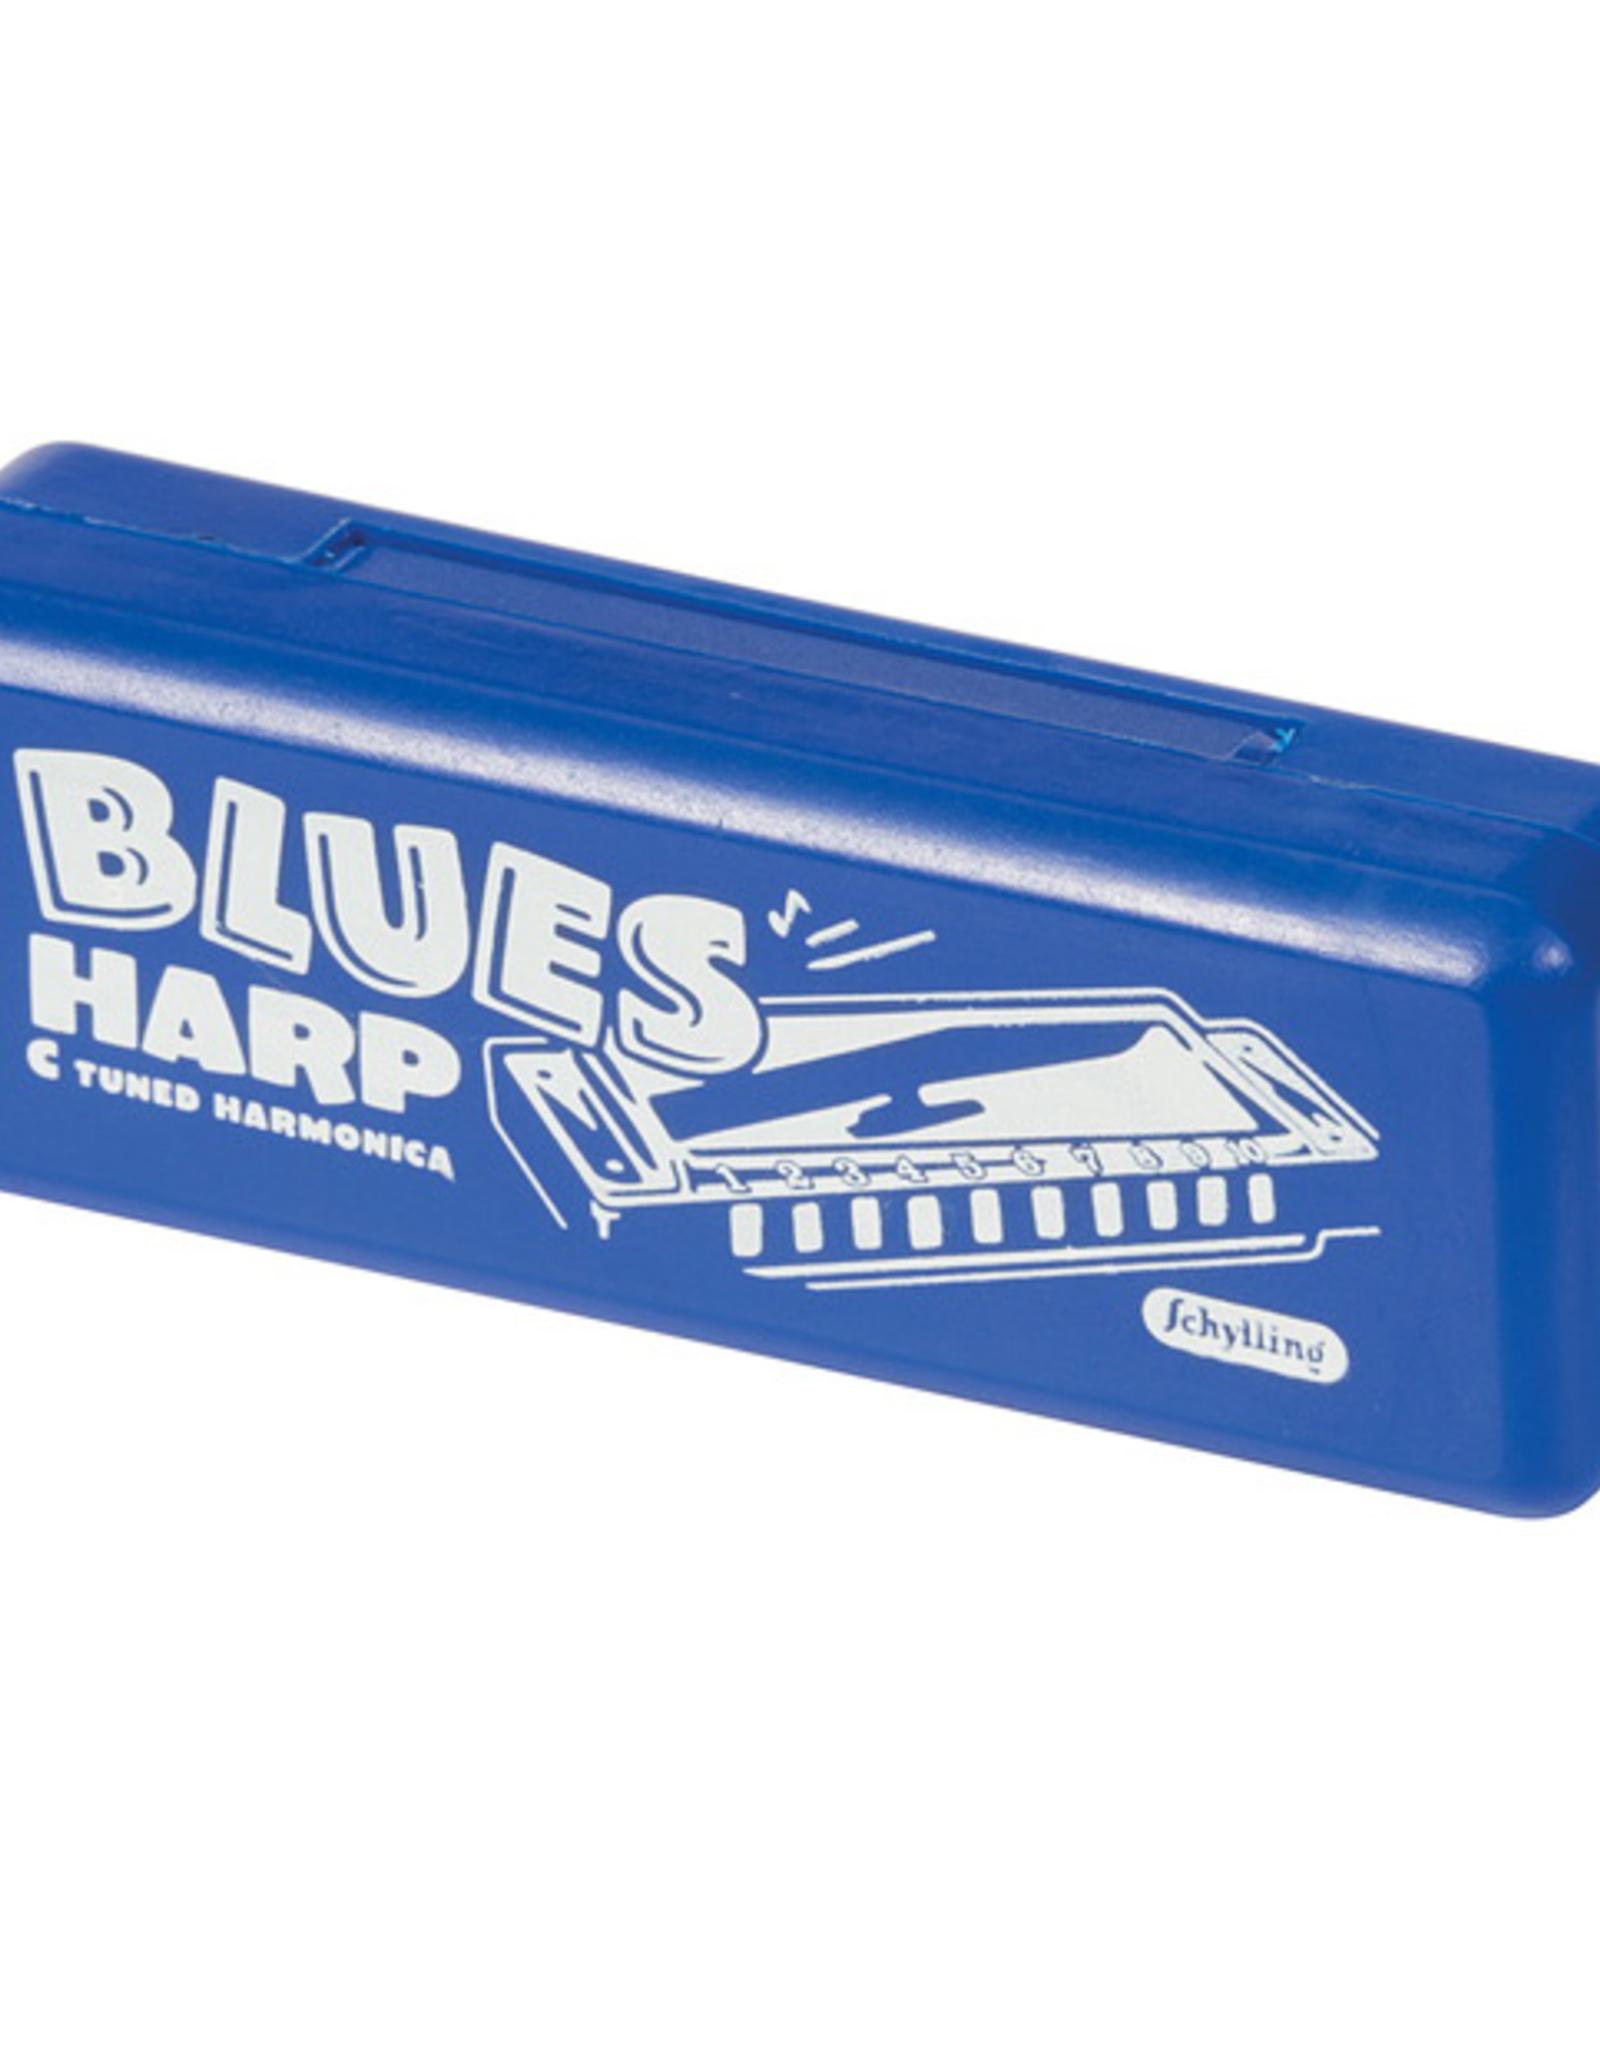 Schylling Blues Harmonica in Plastic Case